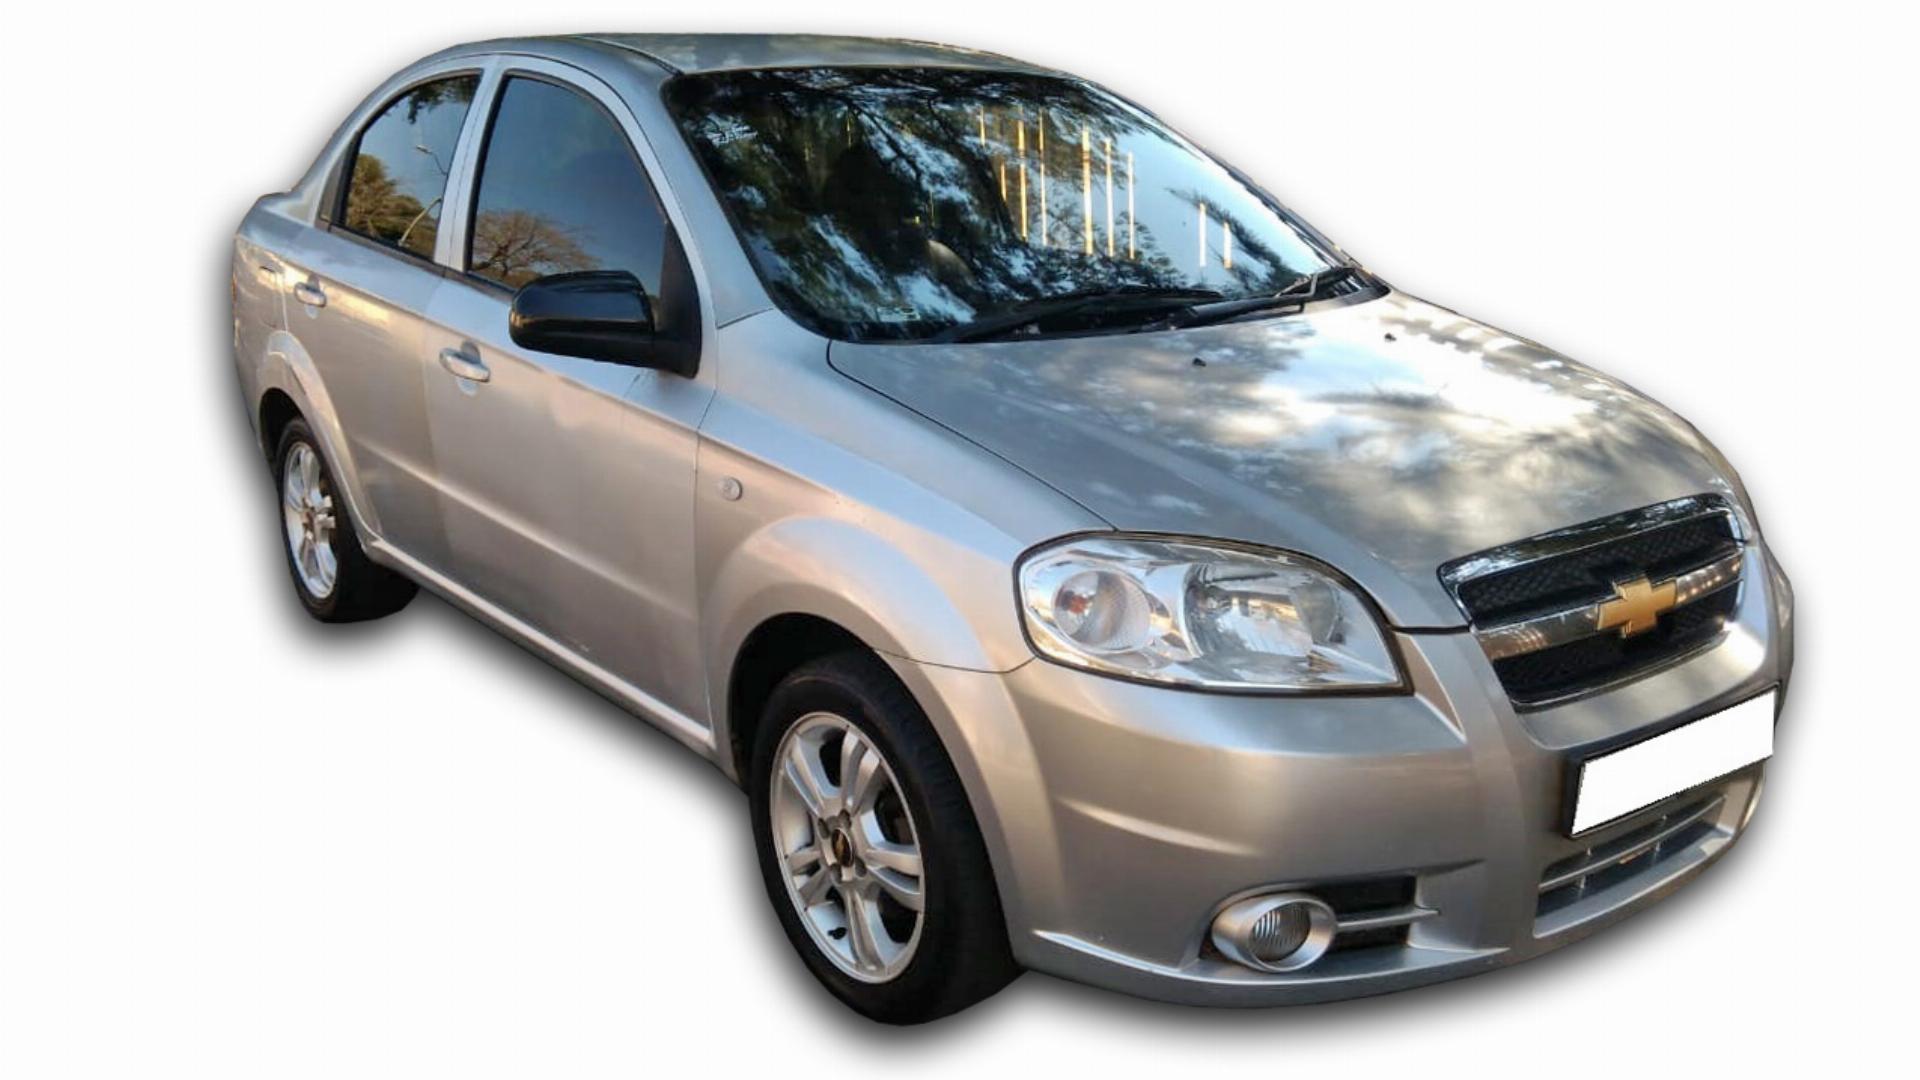 Chevrolet Aveo 1.5L